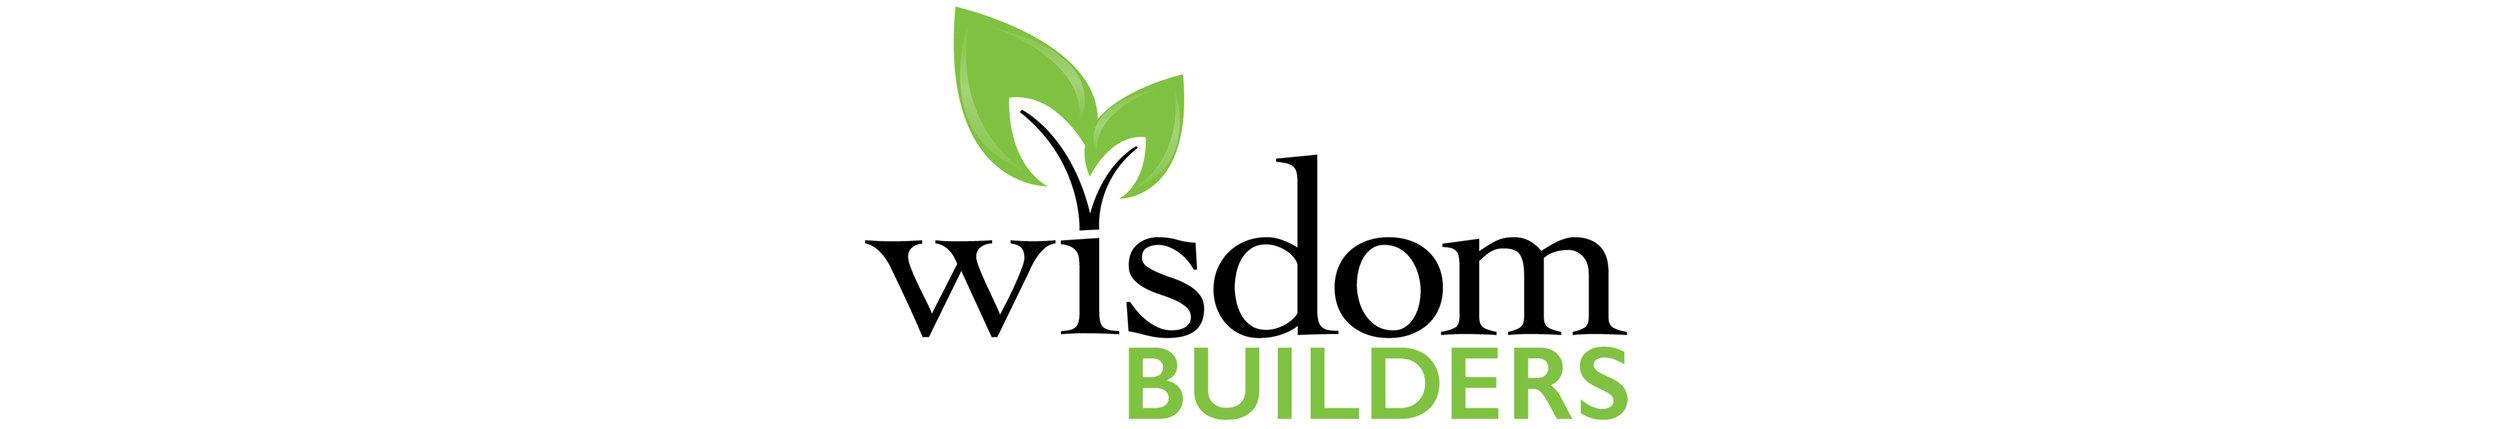 Wisdom Builders Banner.jpg